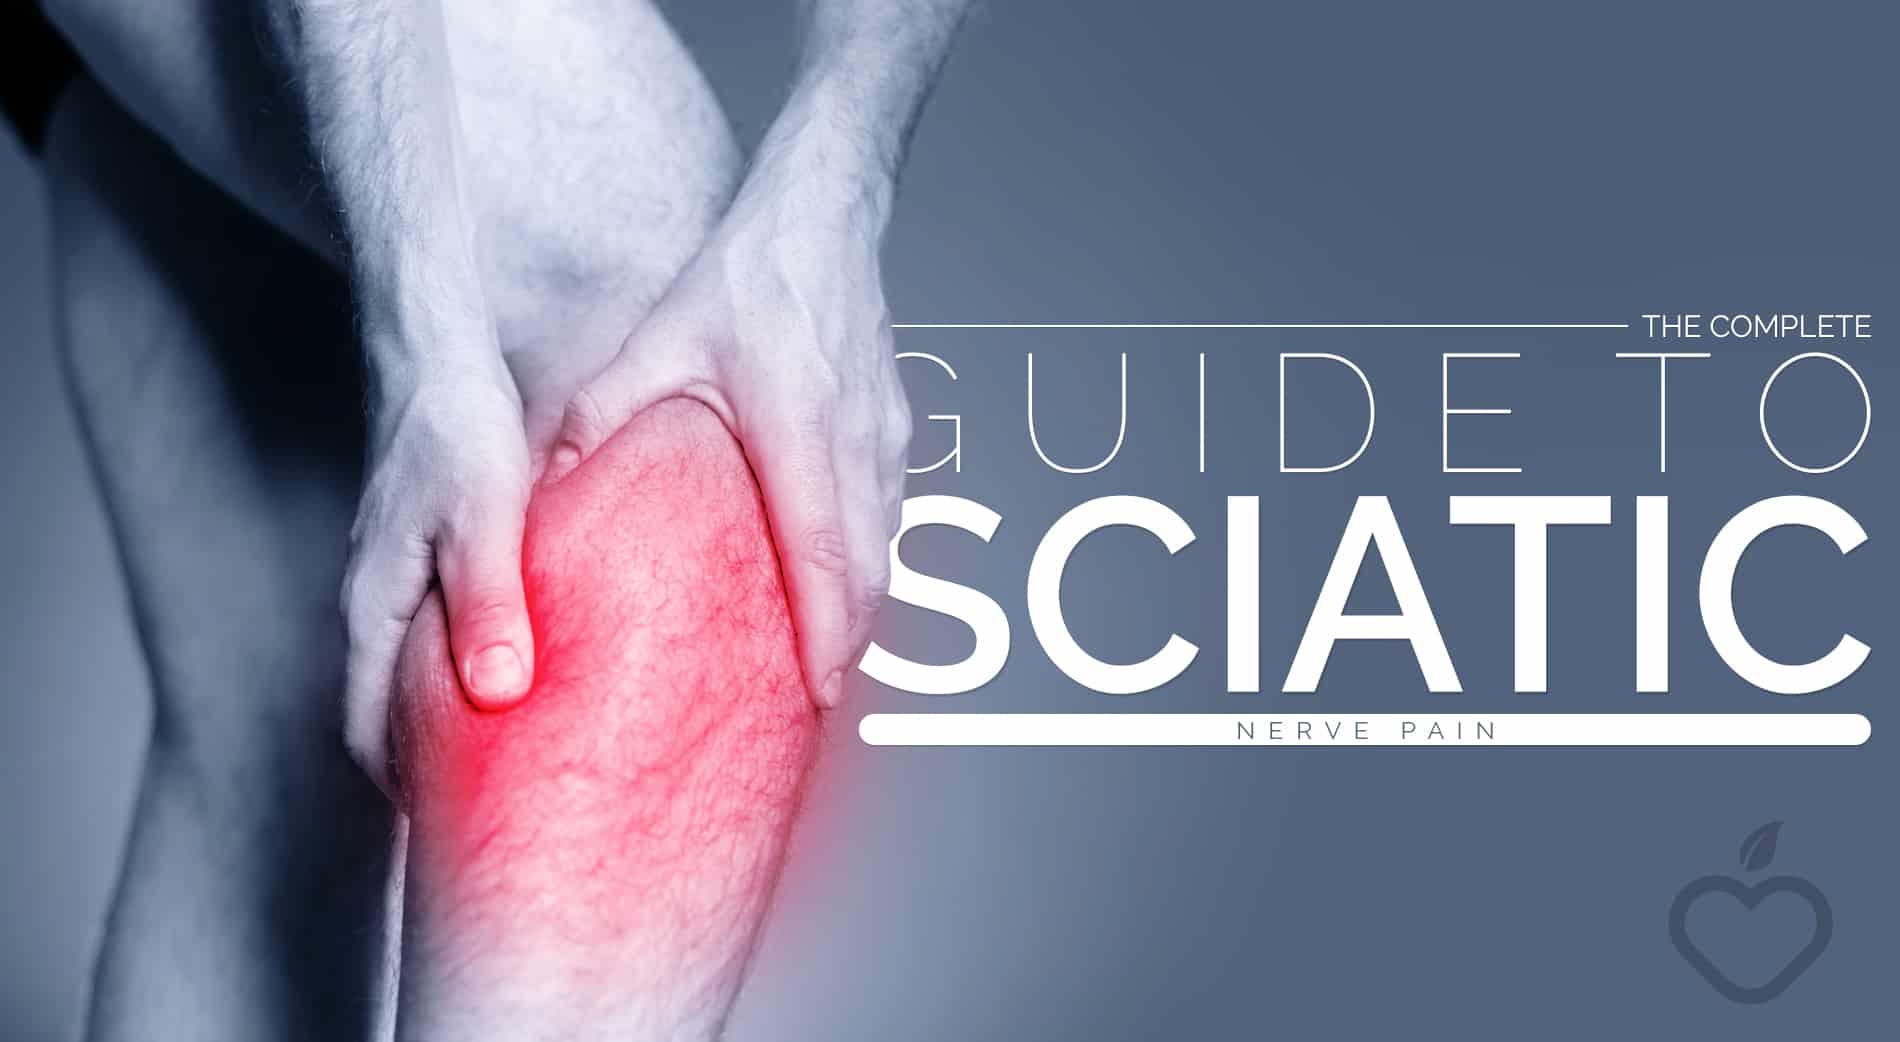 Sciatic Nerve Pain Image Design 1 - The Full Information to Sciatic Nerve Ache